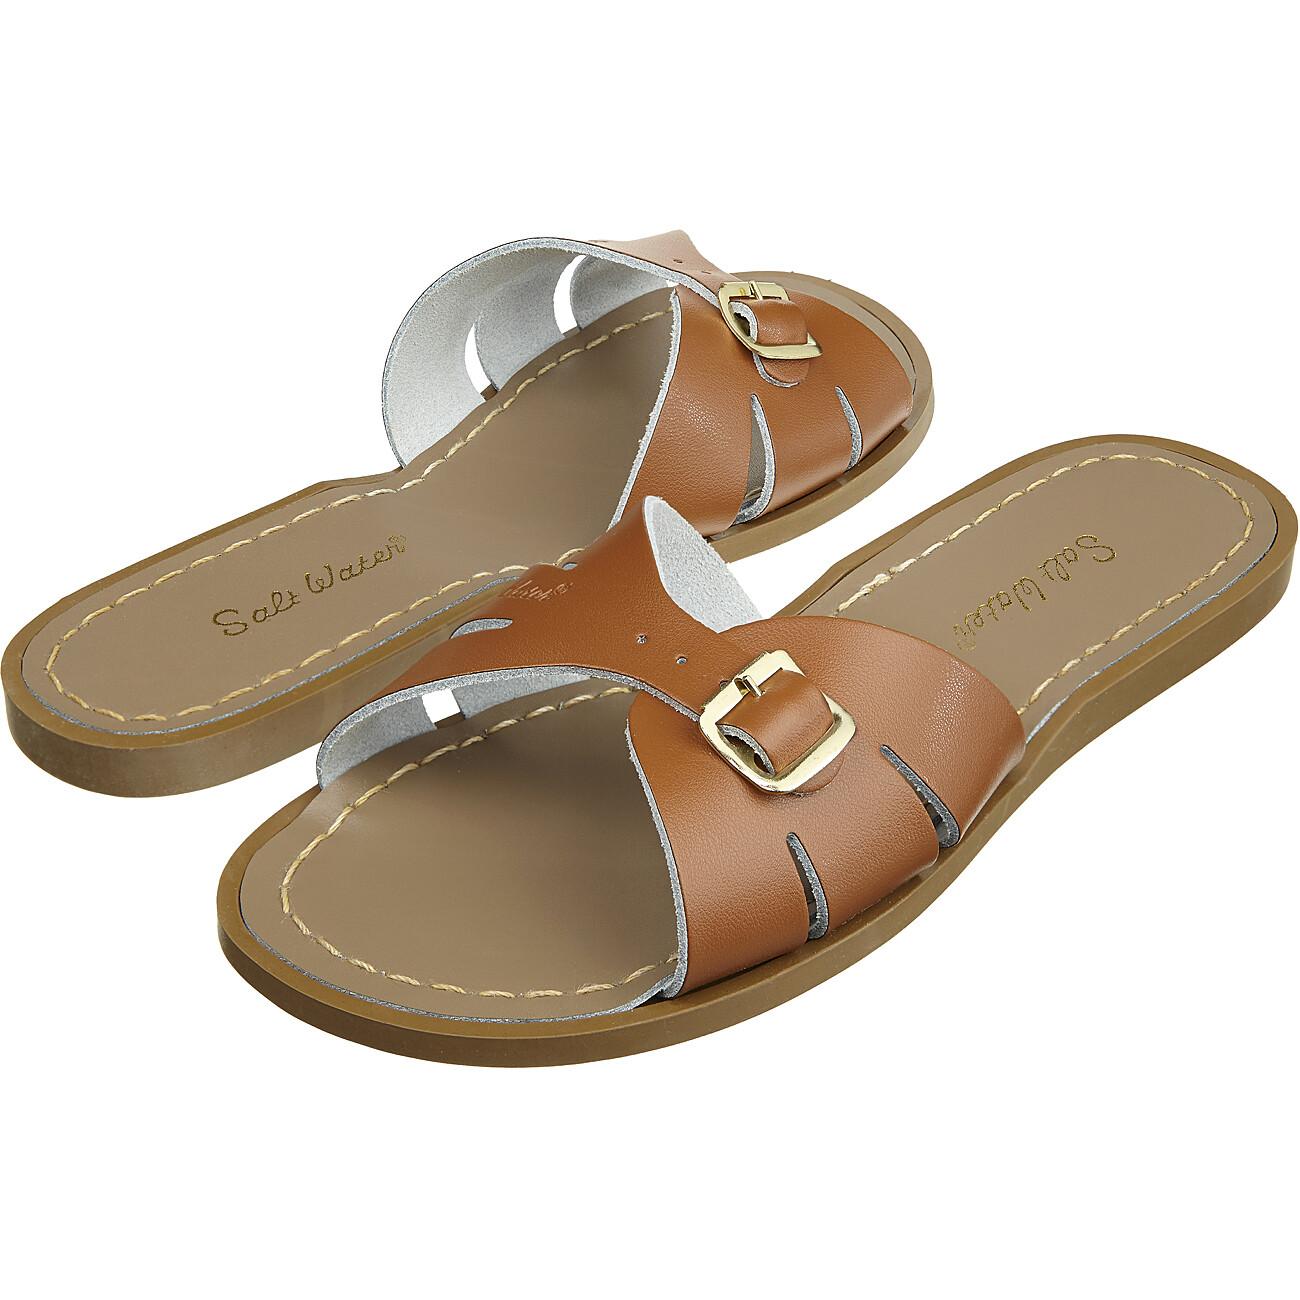 Salt-water sandalen meisjes slides cognac